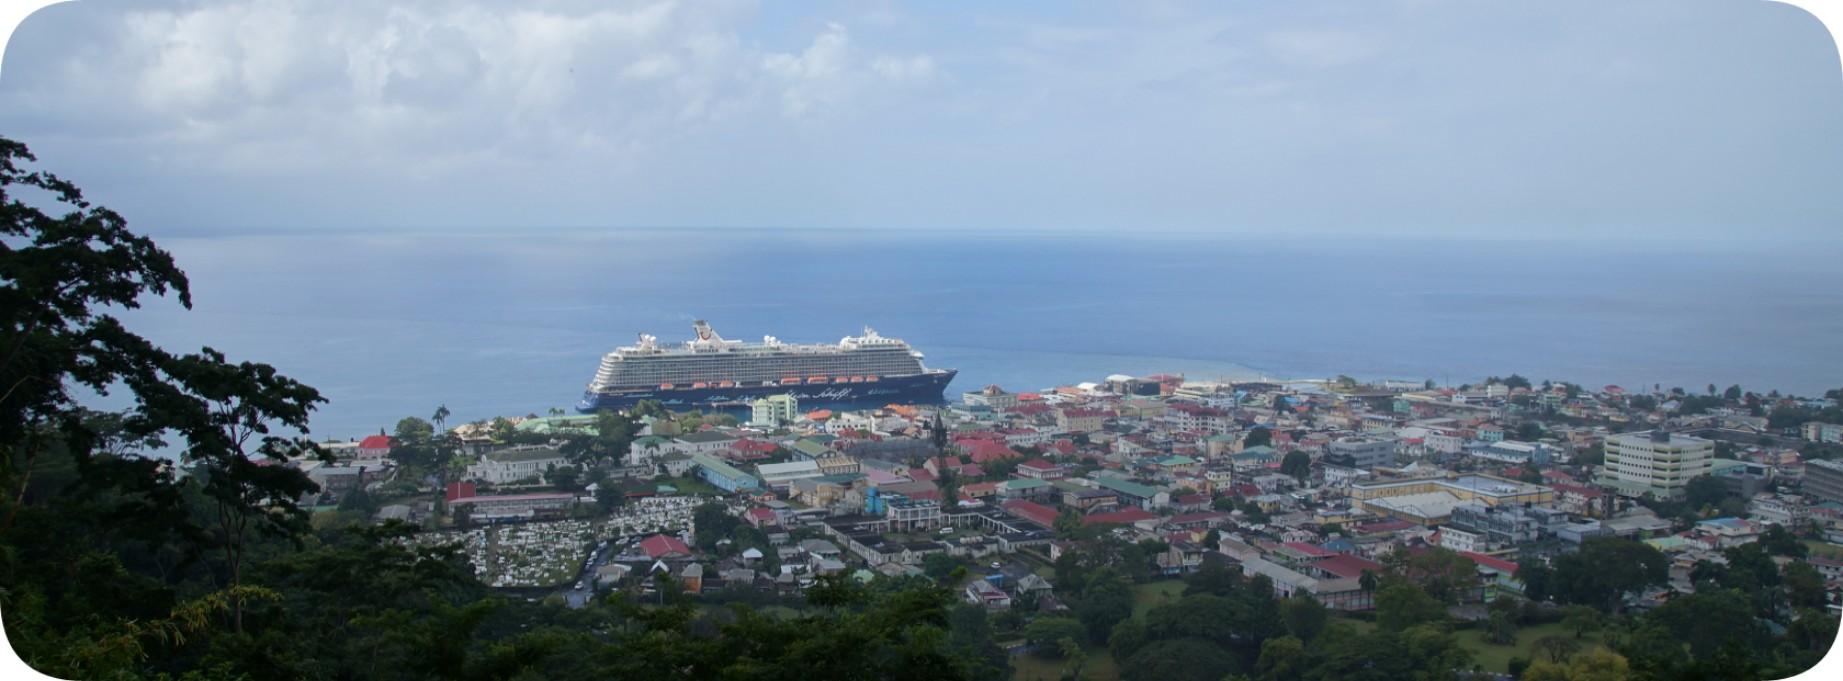 Folge330_ Pollenflug und Dominica